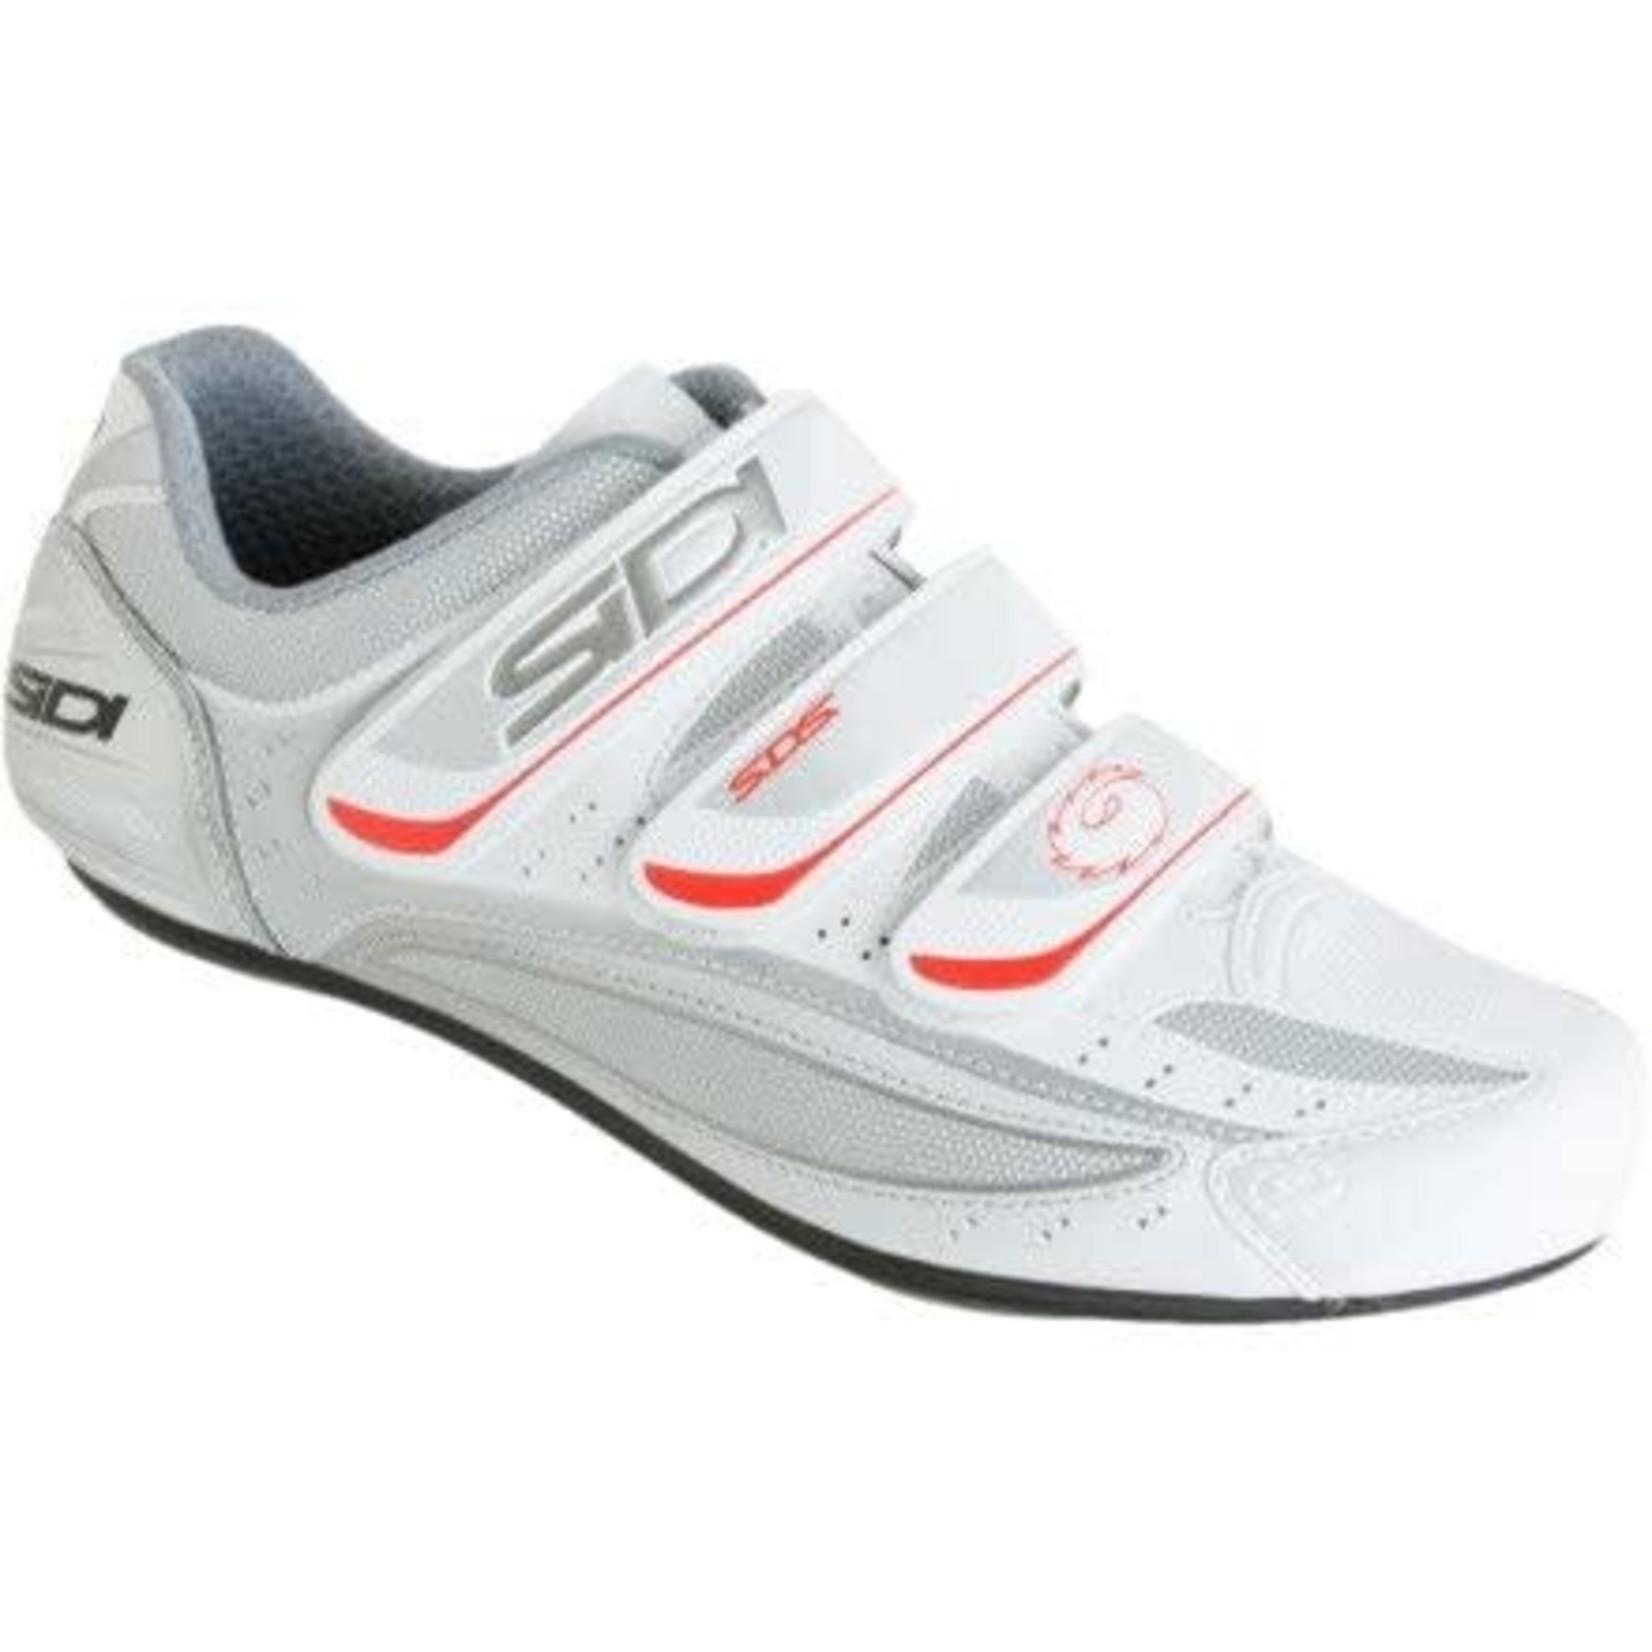 Sidi Sidi Nevada Shoe